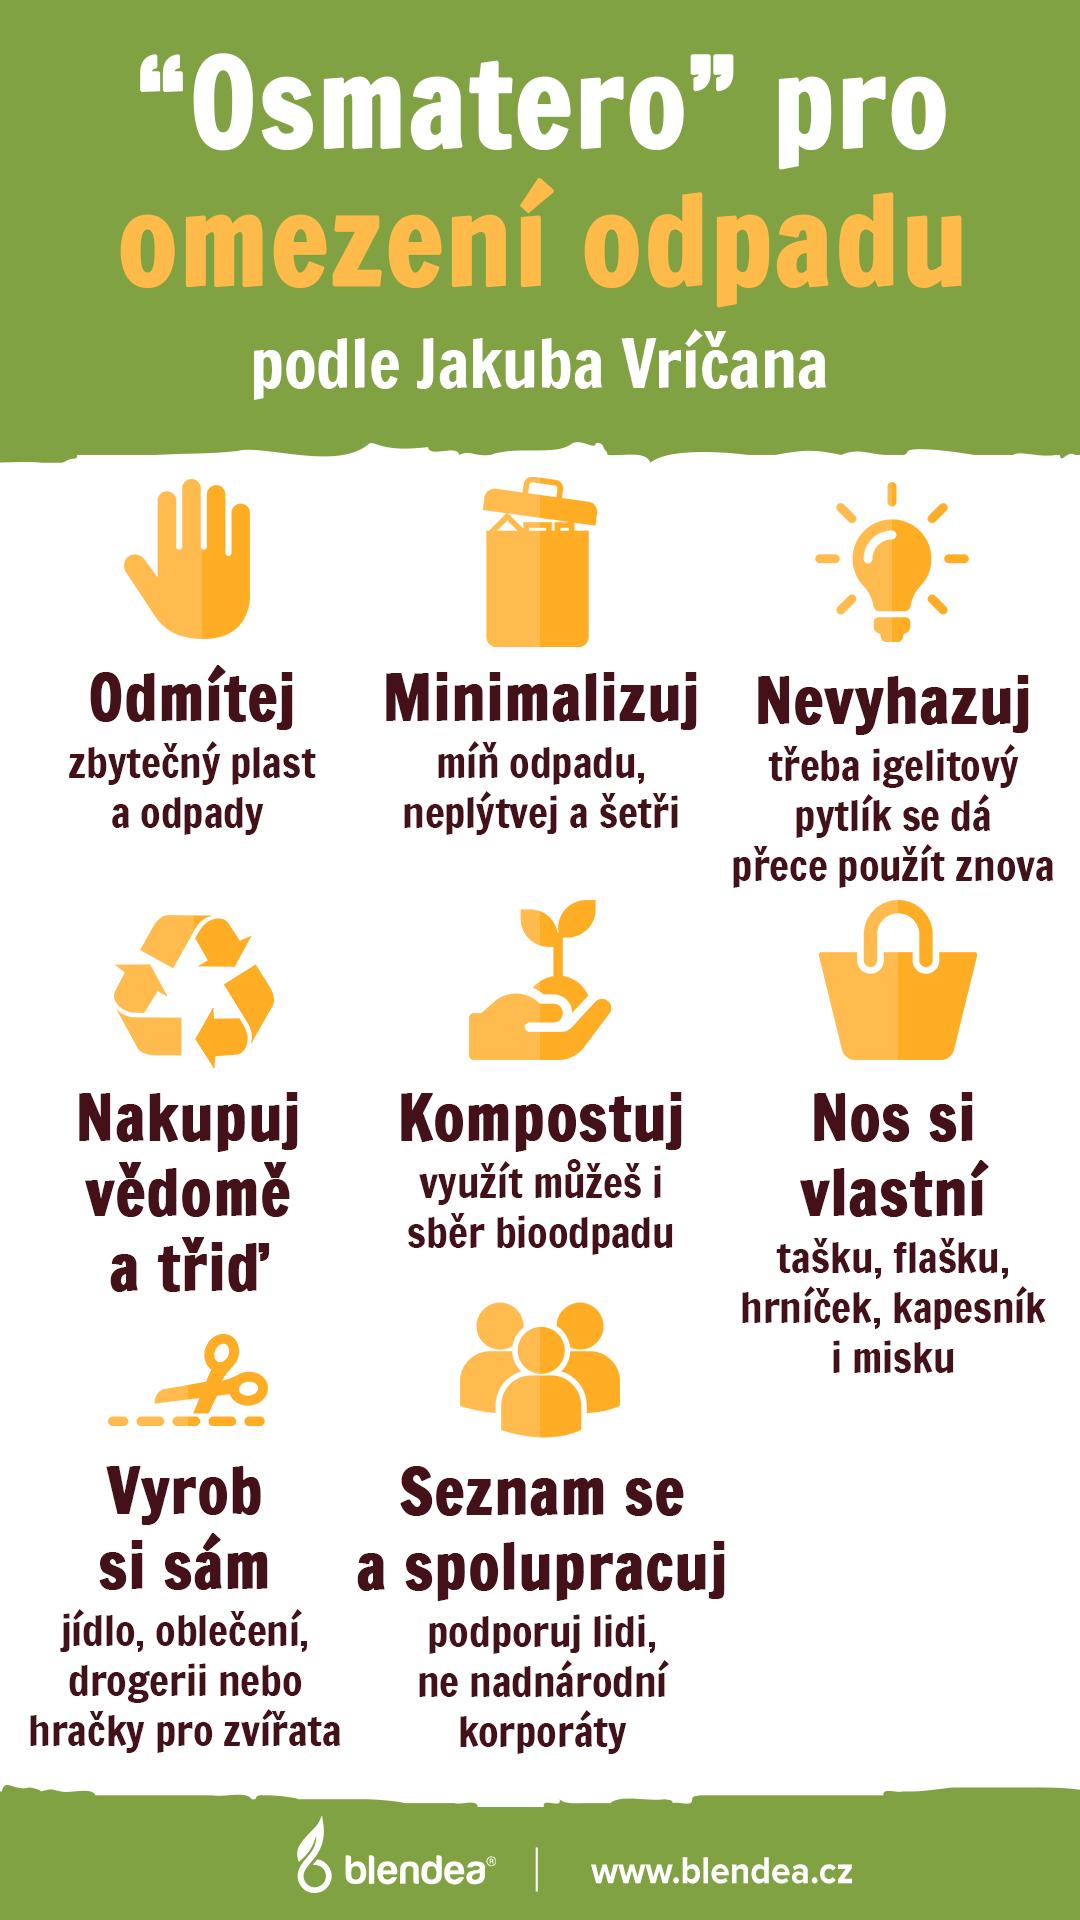 osmatero redukce odpadu infografika